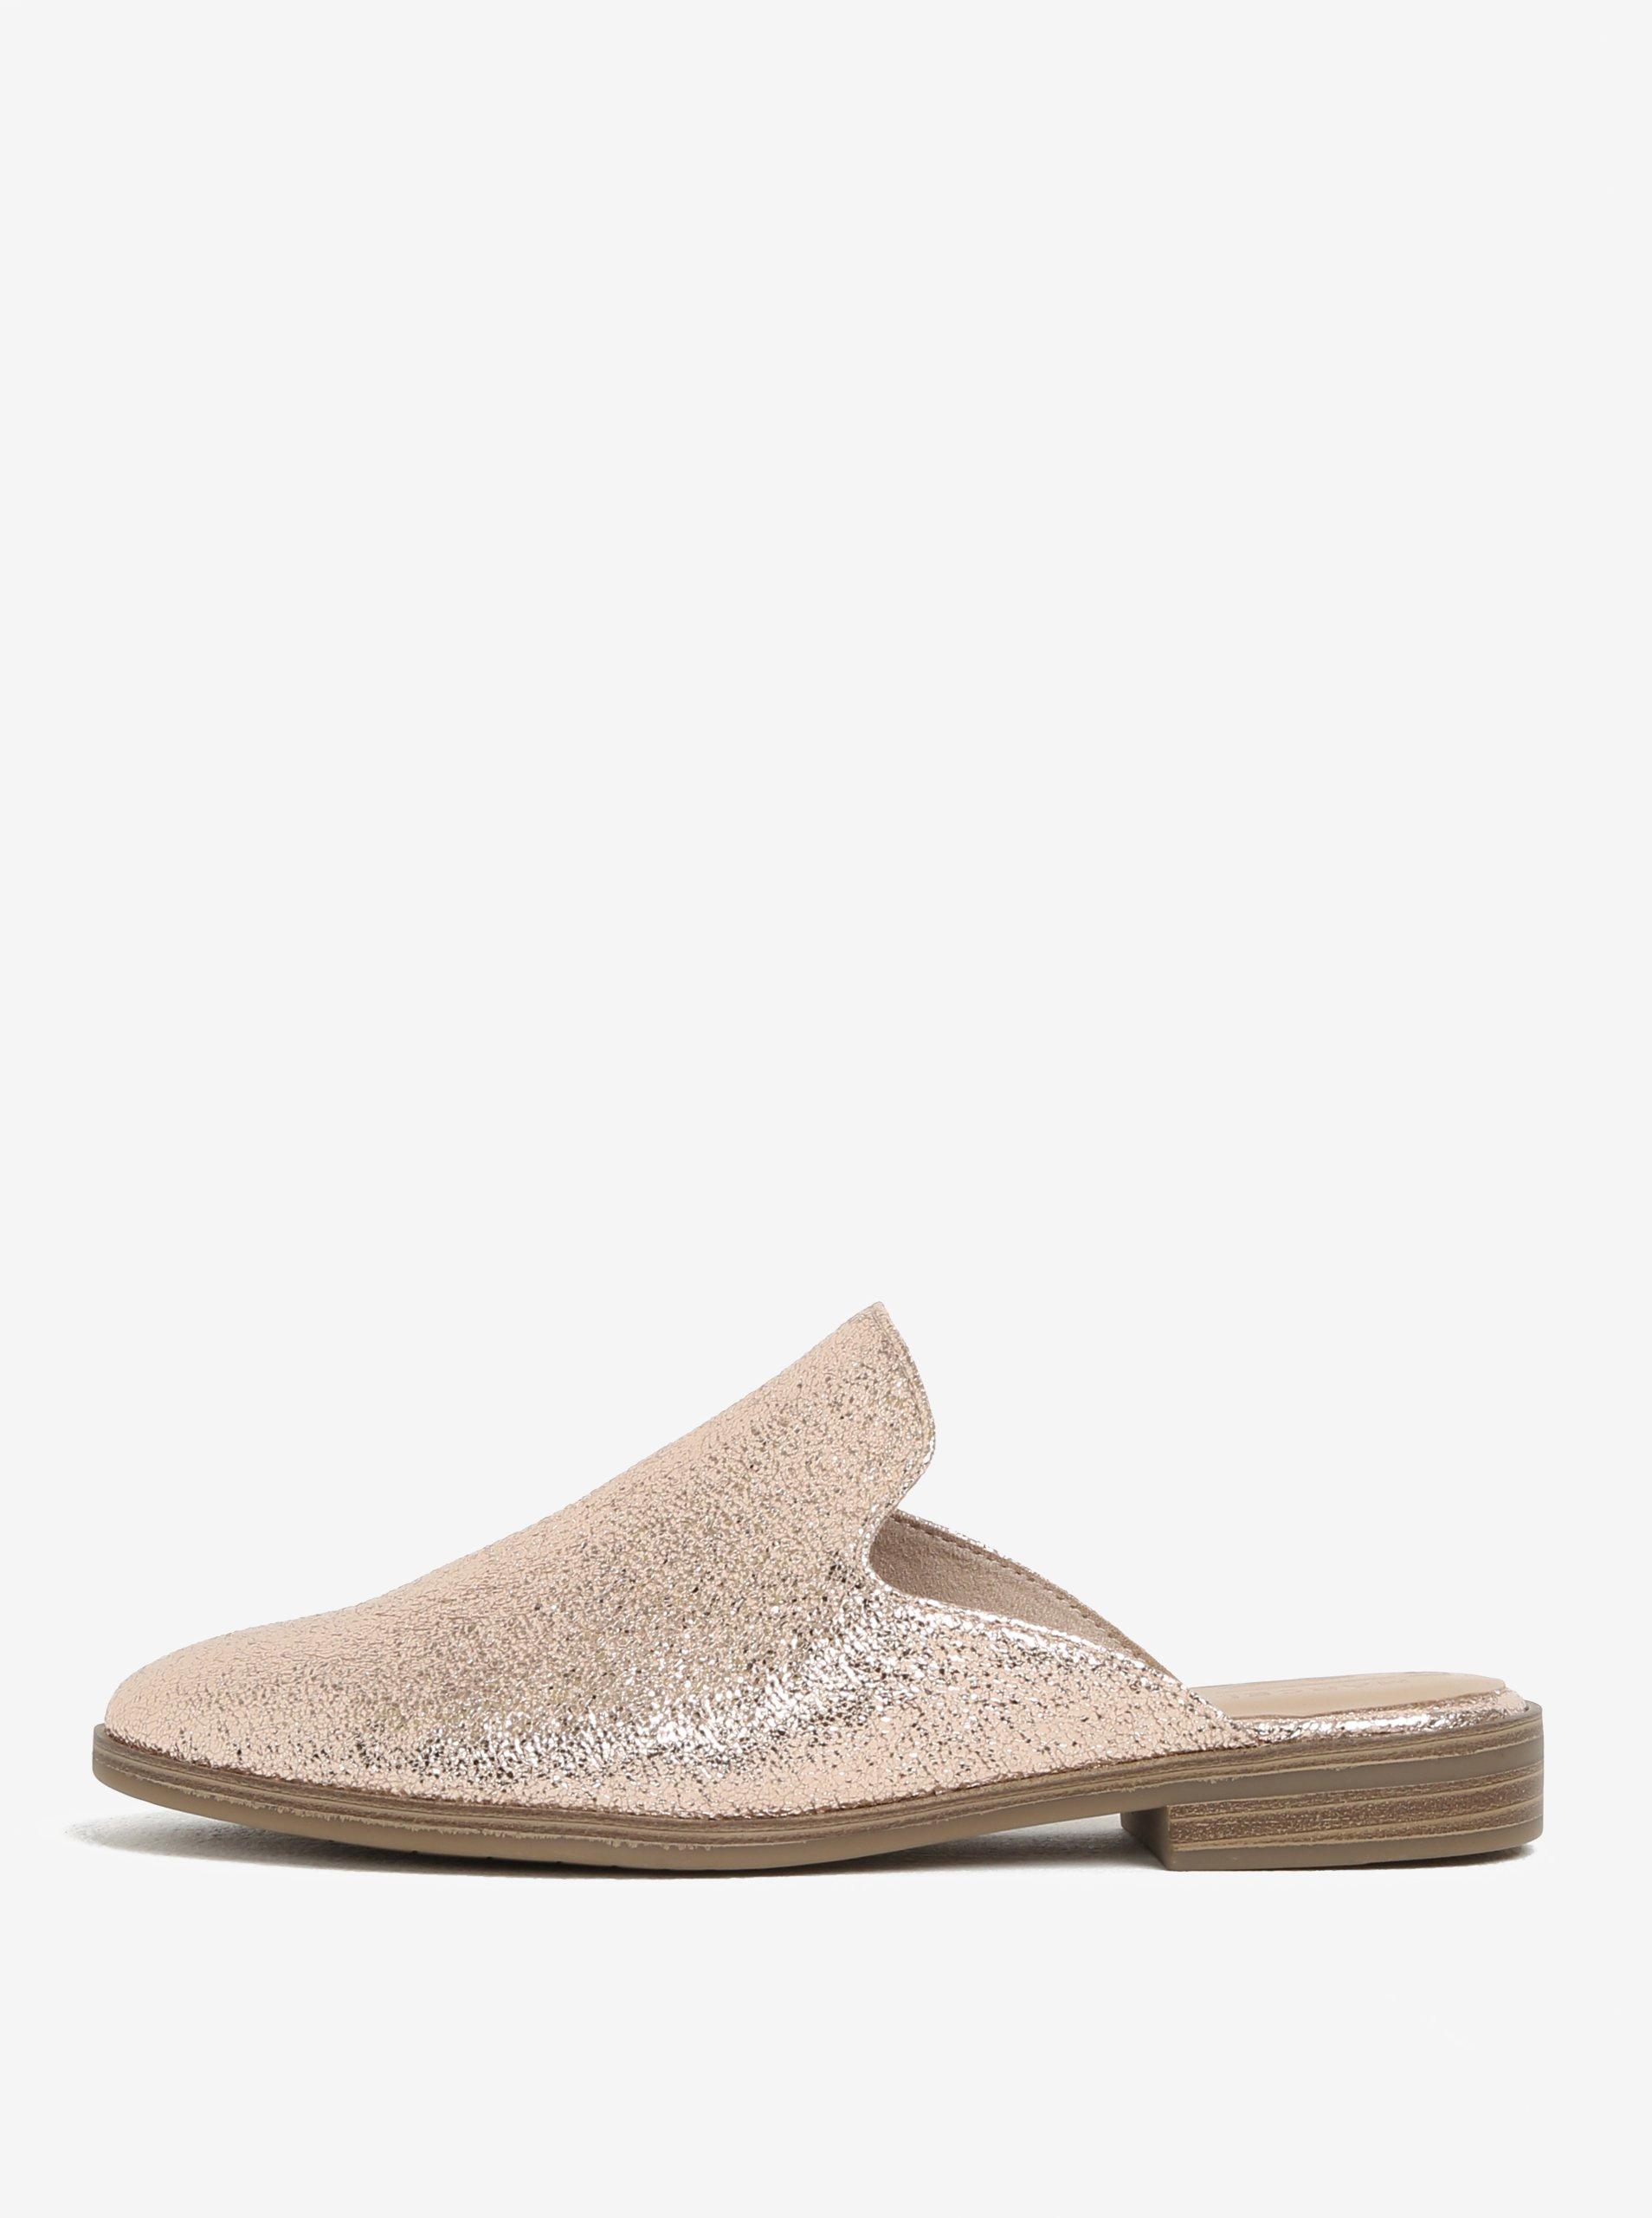 Lesklé pantofle v růžovozlaté barvě Tamaris